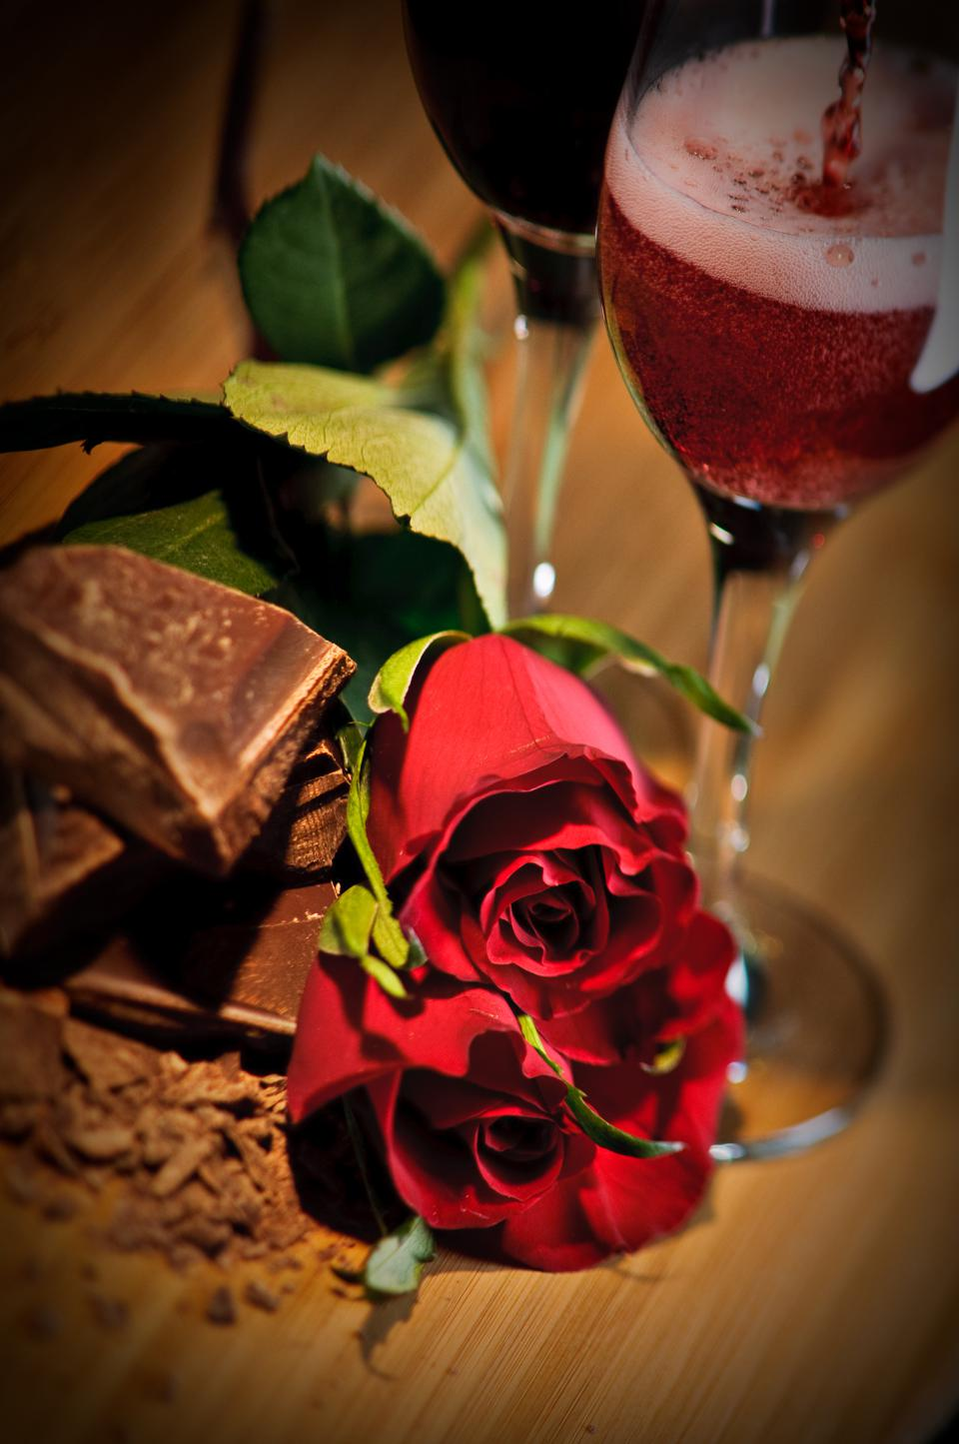 Chocolate, Roses And Dessert Wine